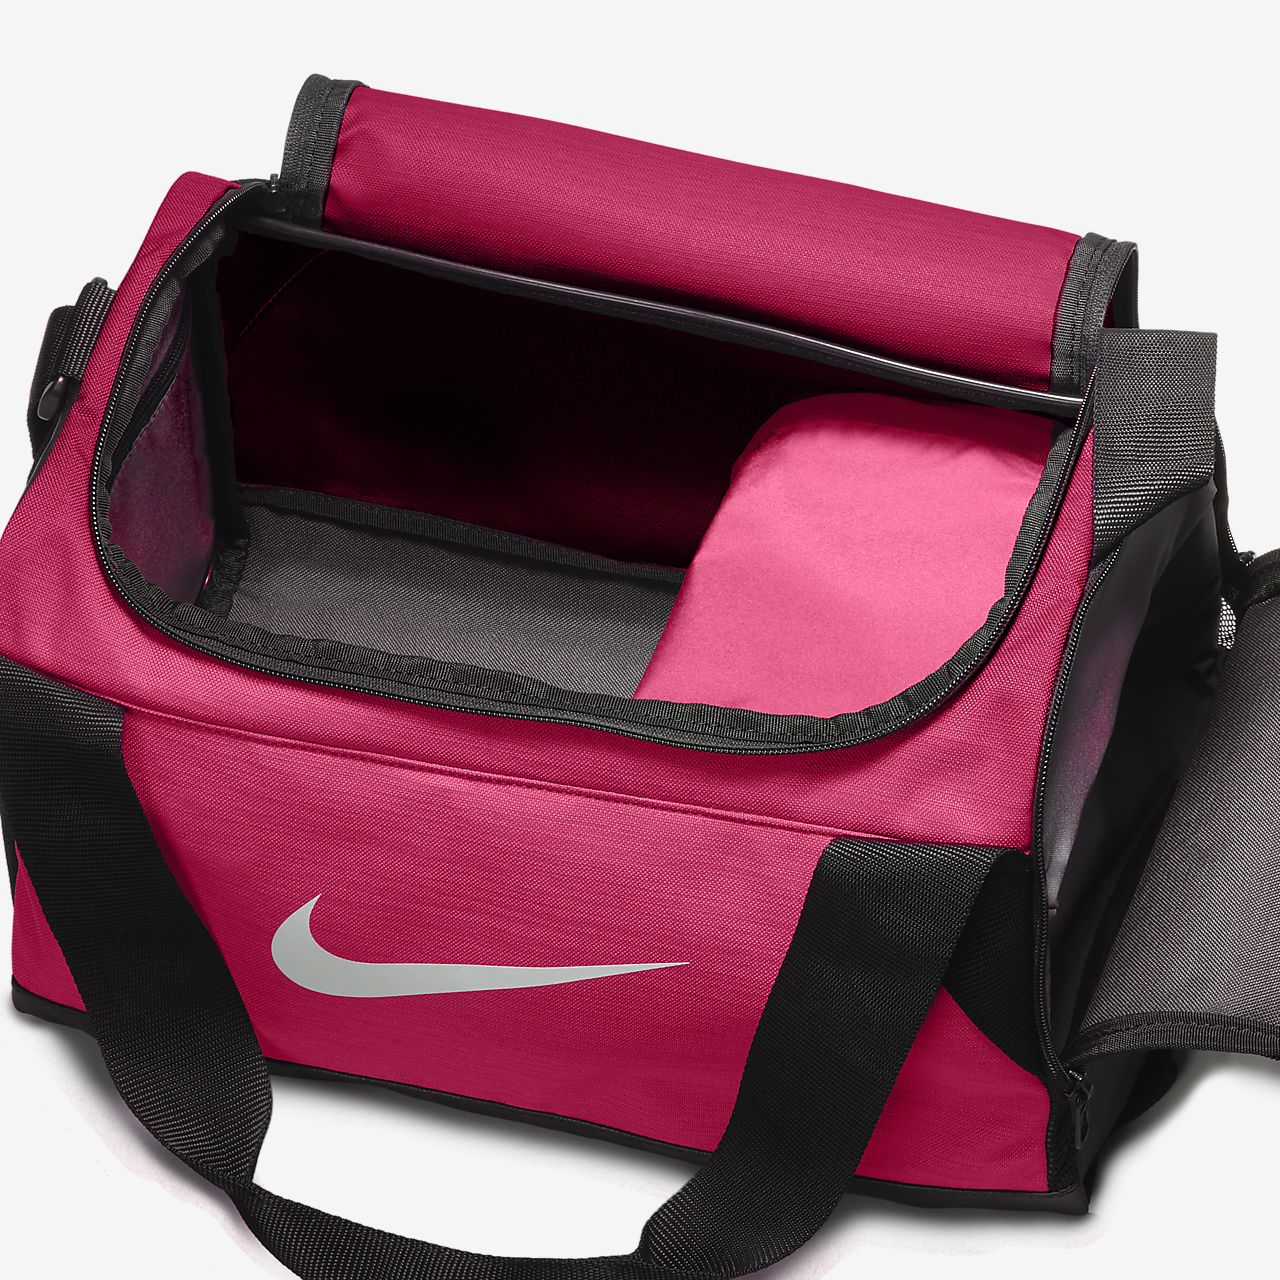 52b851e32147 Nike Brasilia (Extra Small) Training Duffel Bag. Nike.com AU